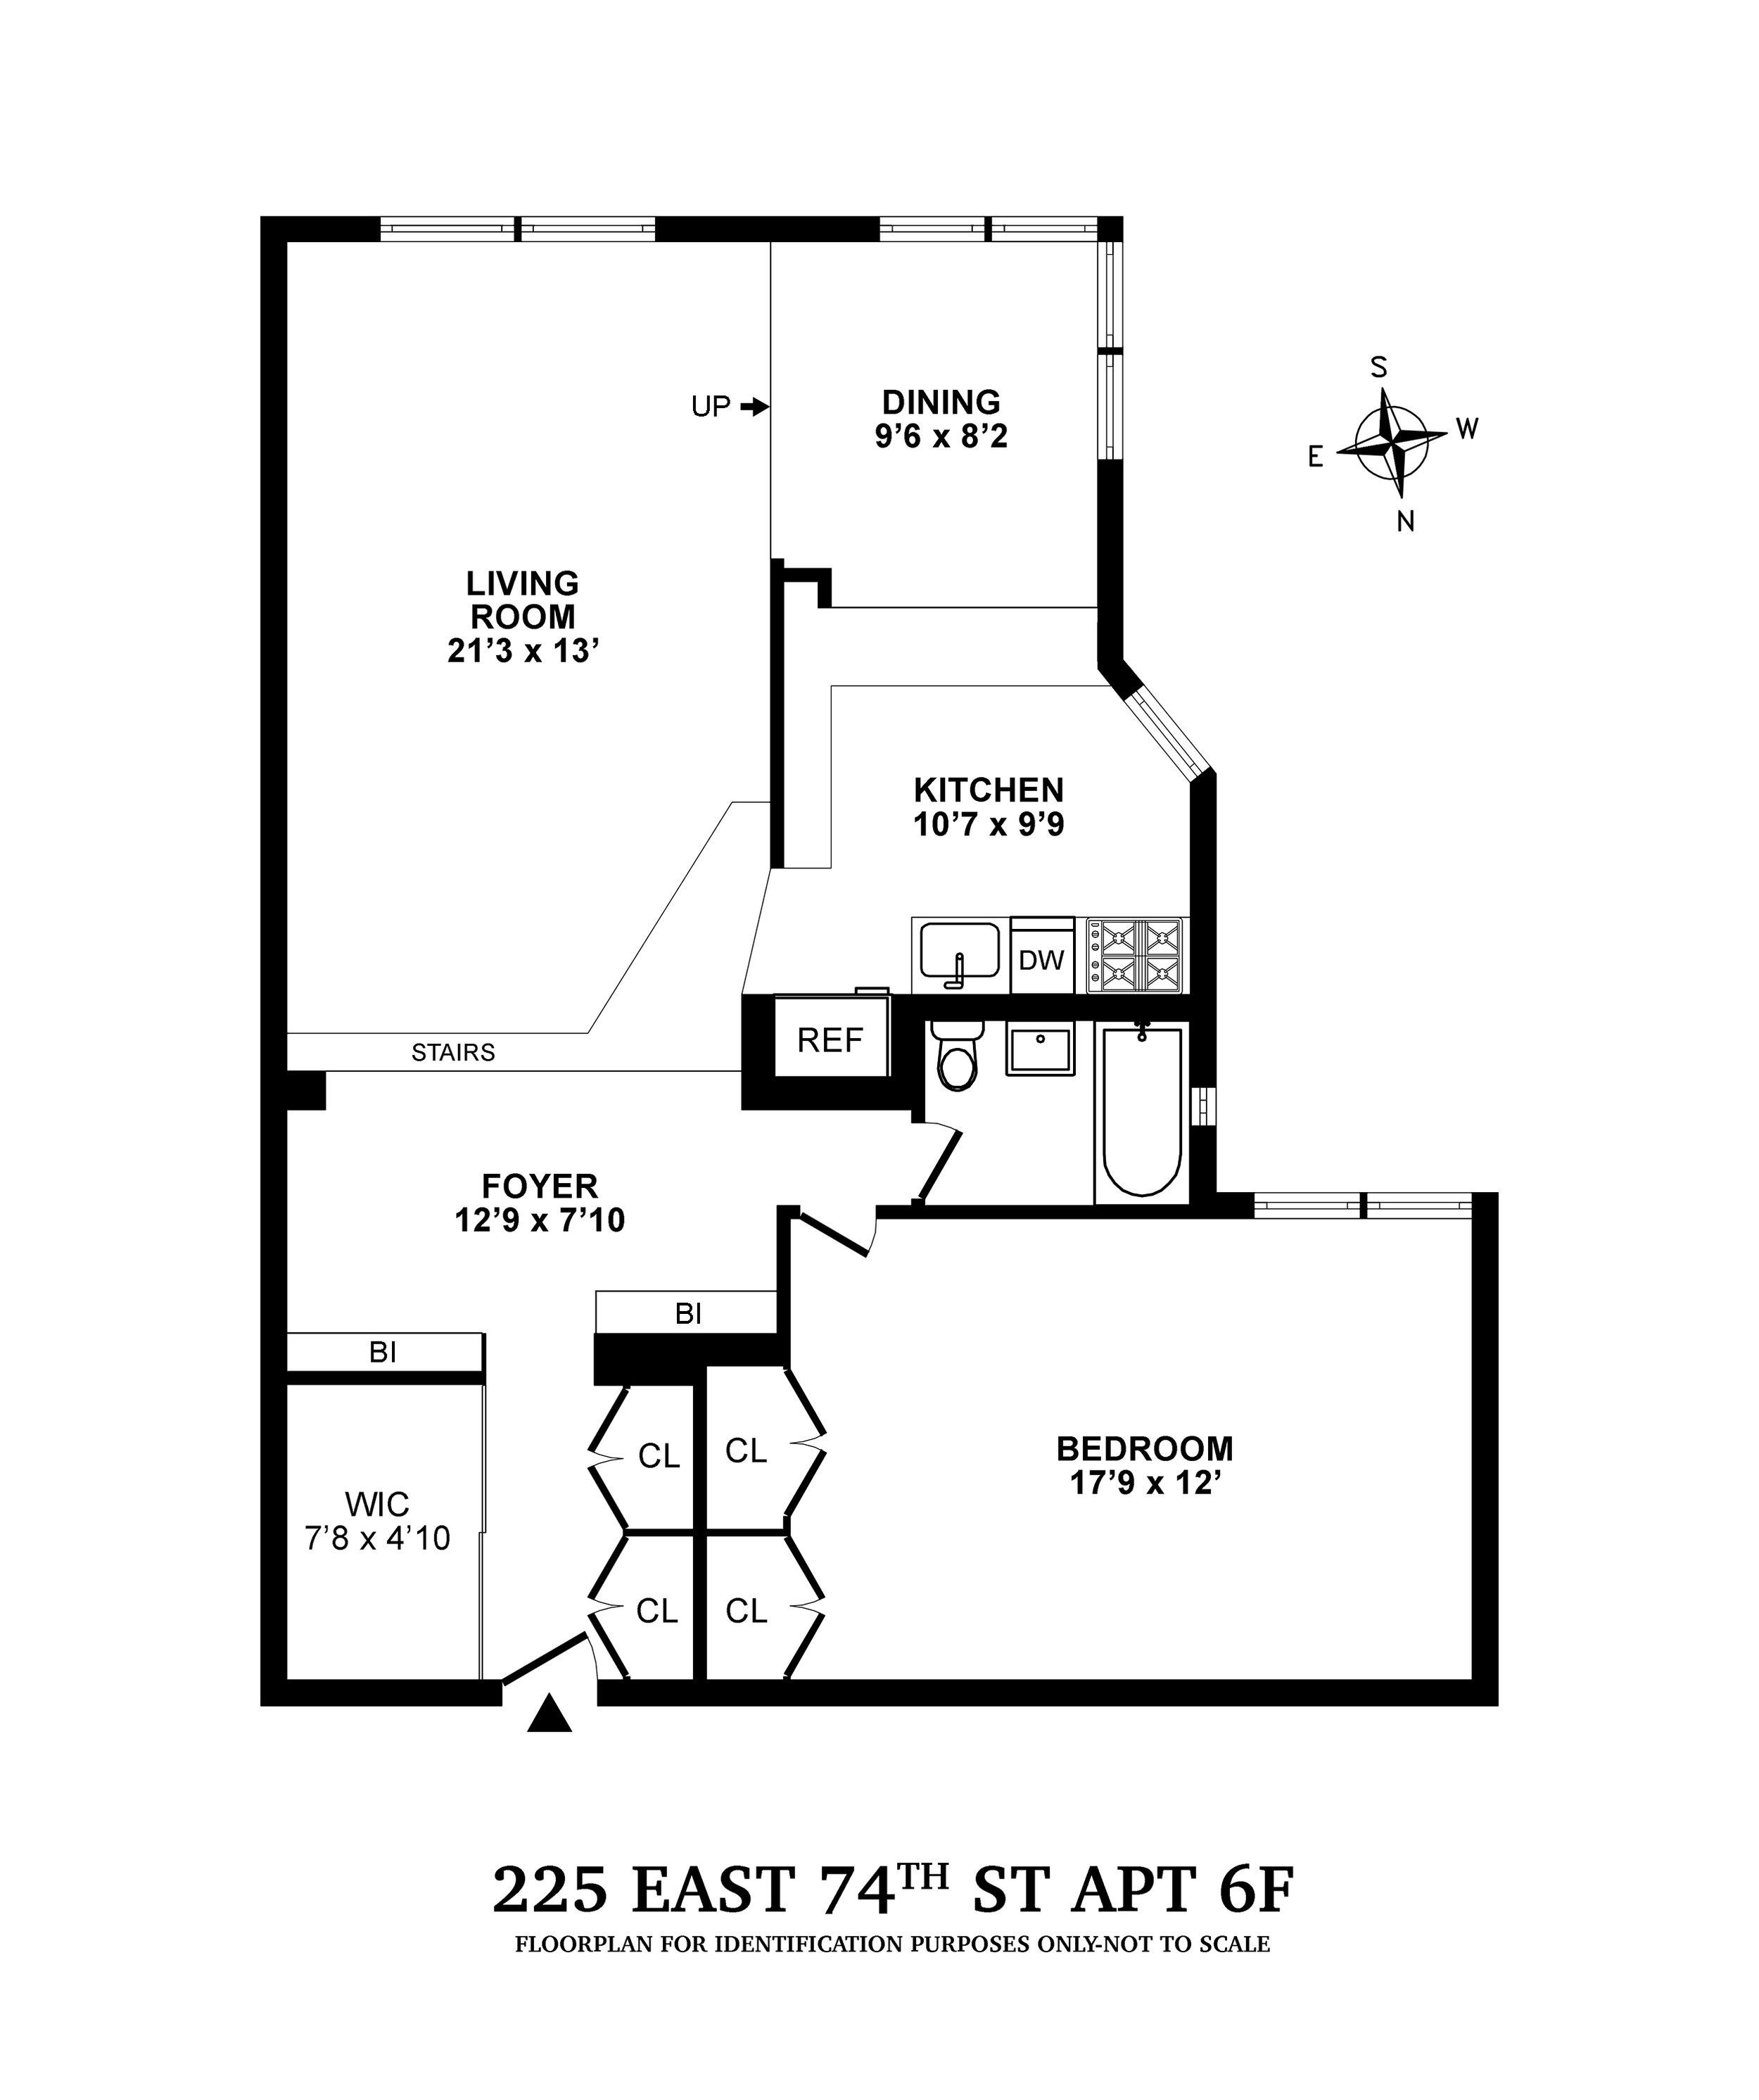 225 East 74th St Apt 6F-GPFP-EDIT.jpg